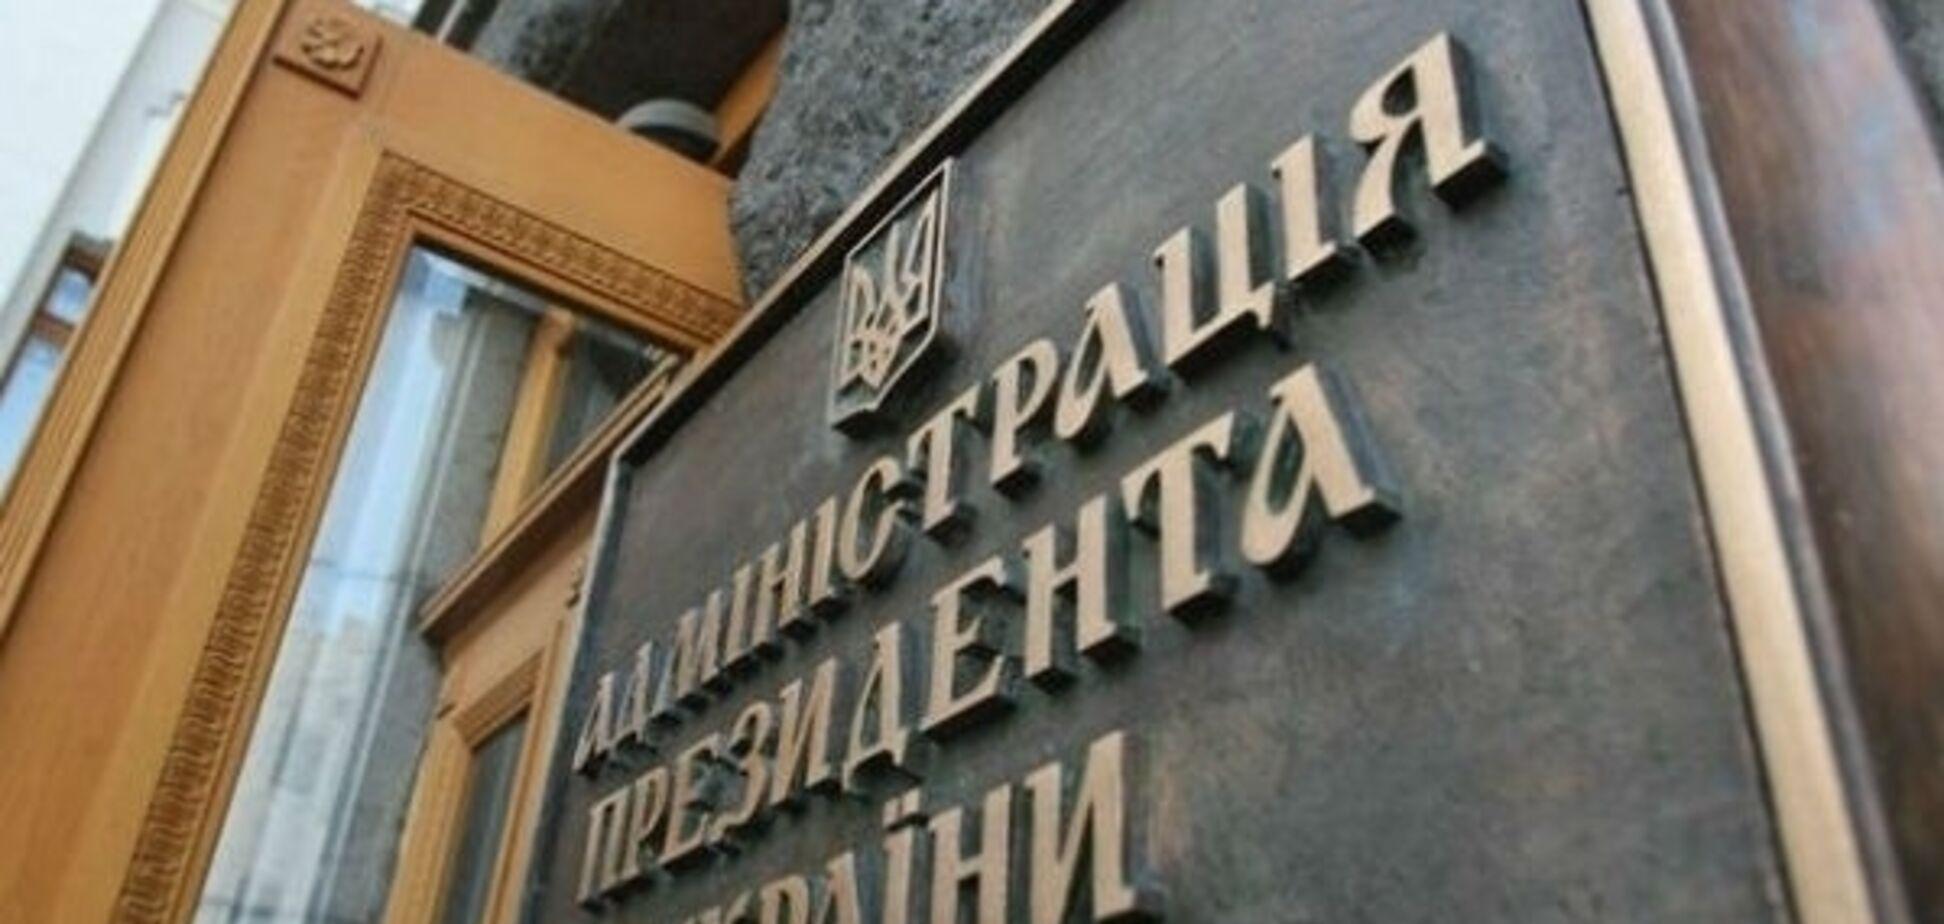 Пропажа техники в АП: Шимкив прояснил важный нюанс